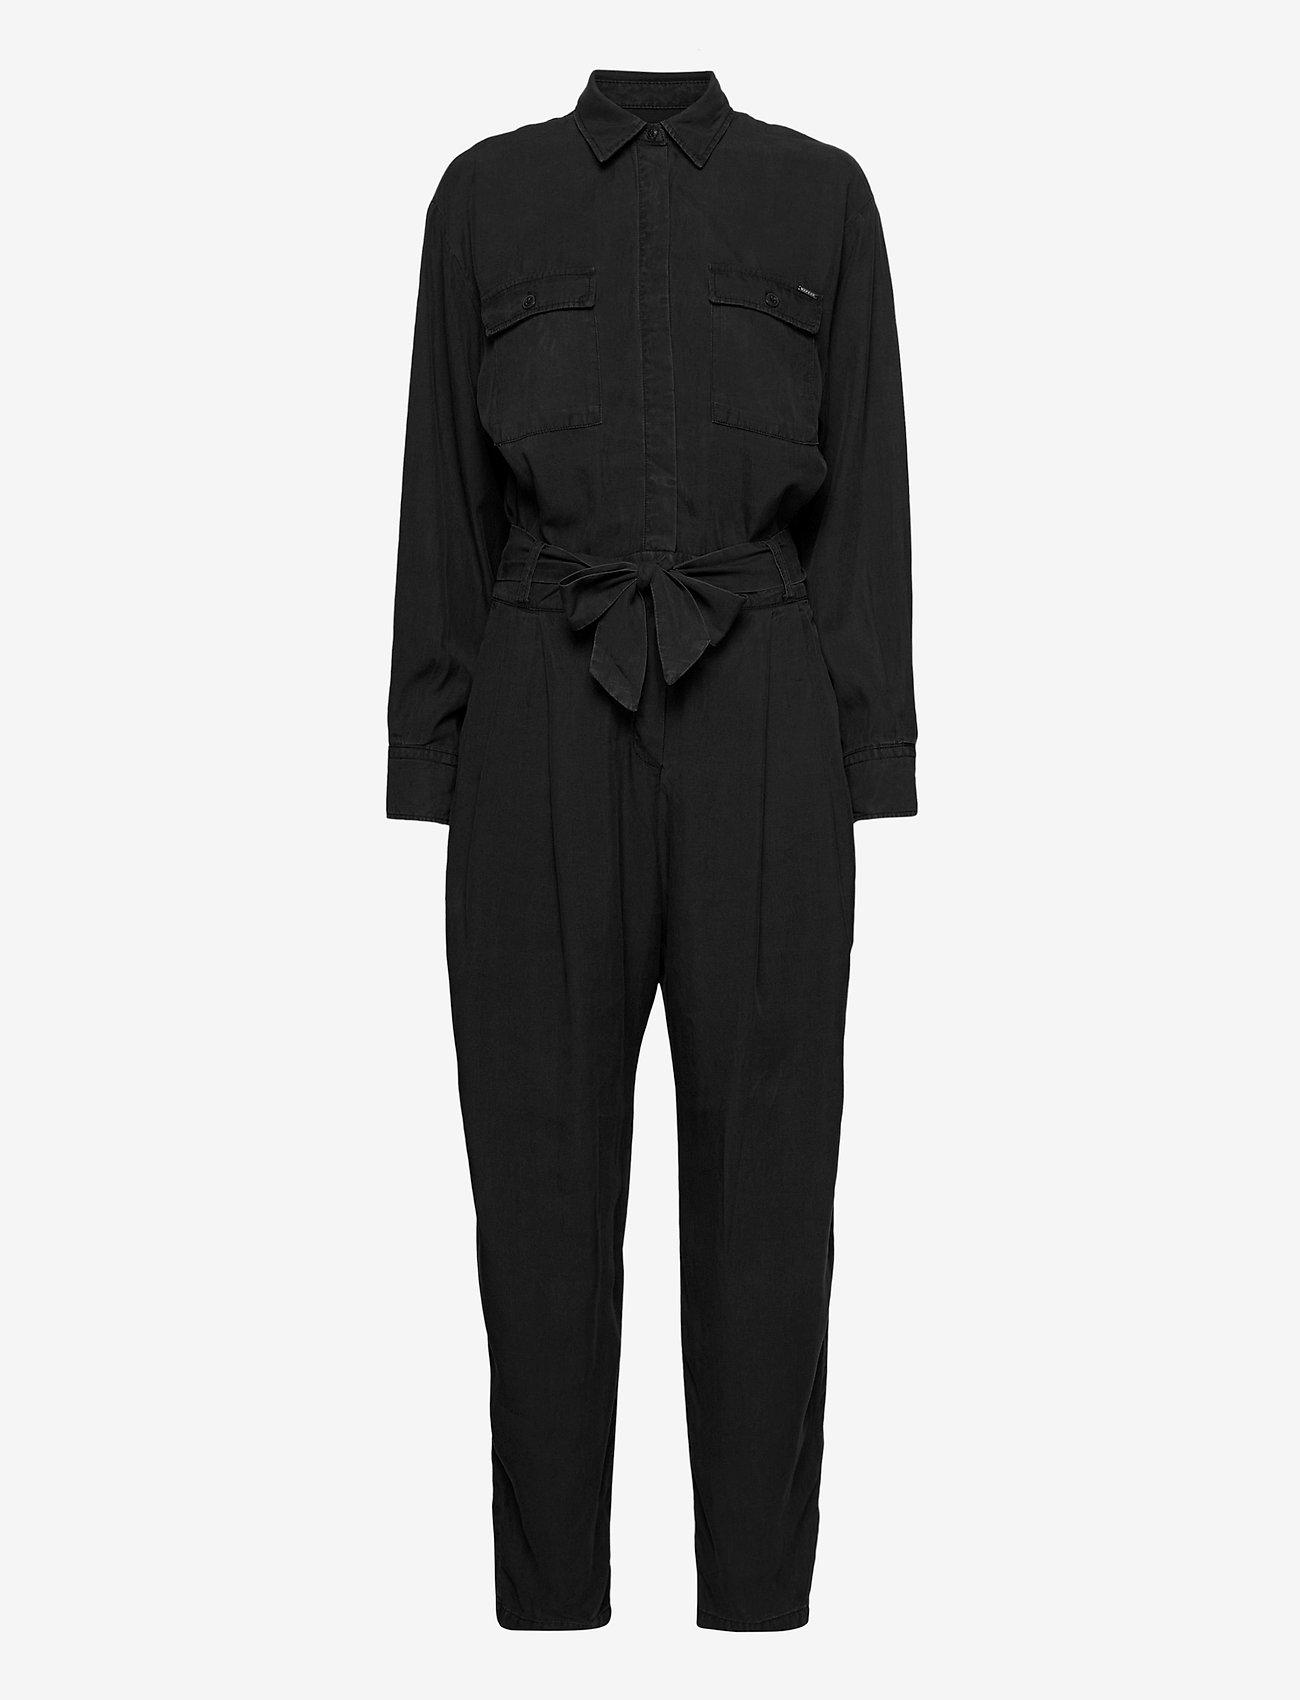 Replay - Jumpsuit - kleding - black - 0